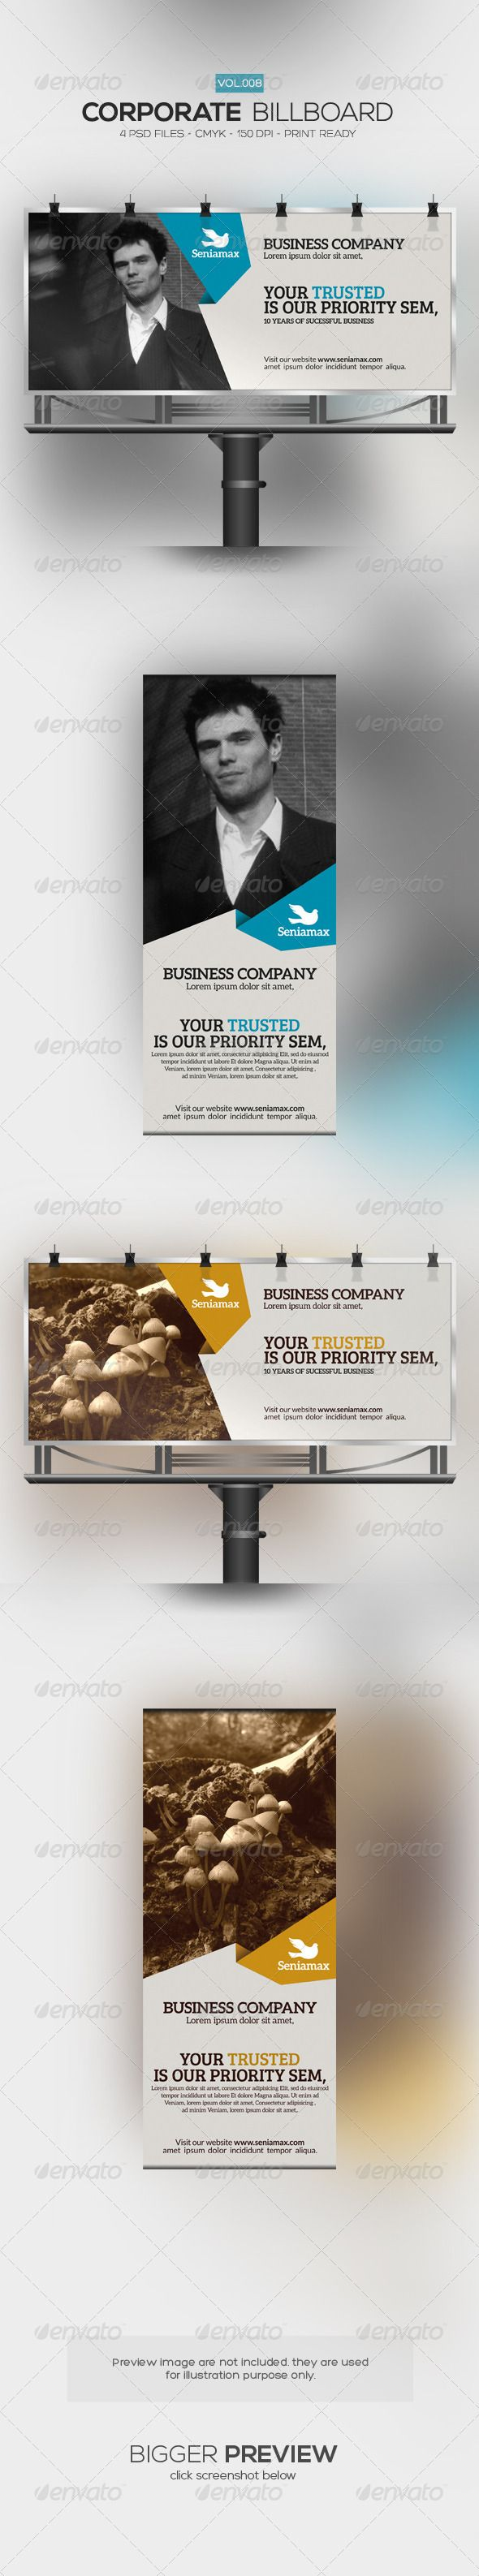 Corporate Billboard Template #design #ads Download: http://graphicriver.net/item/corporate-billboard-008/7396309?ref=ksioks